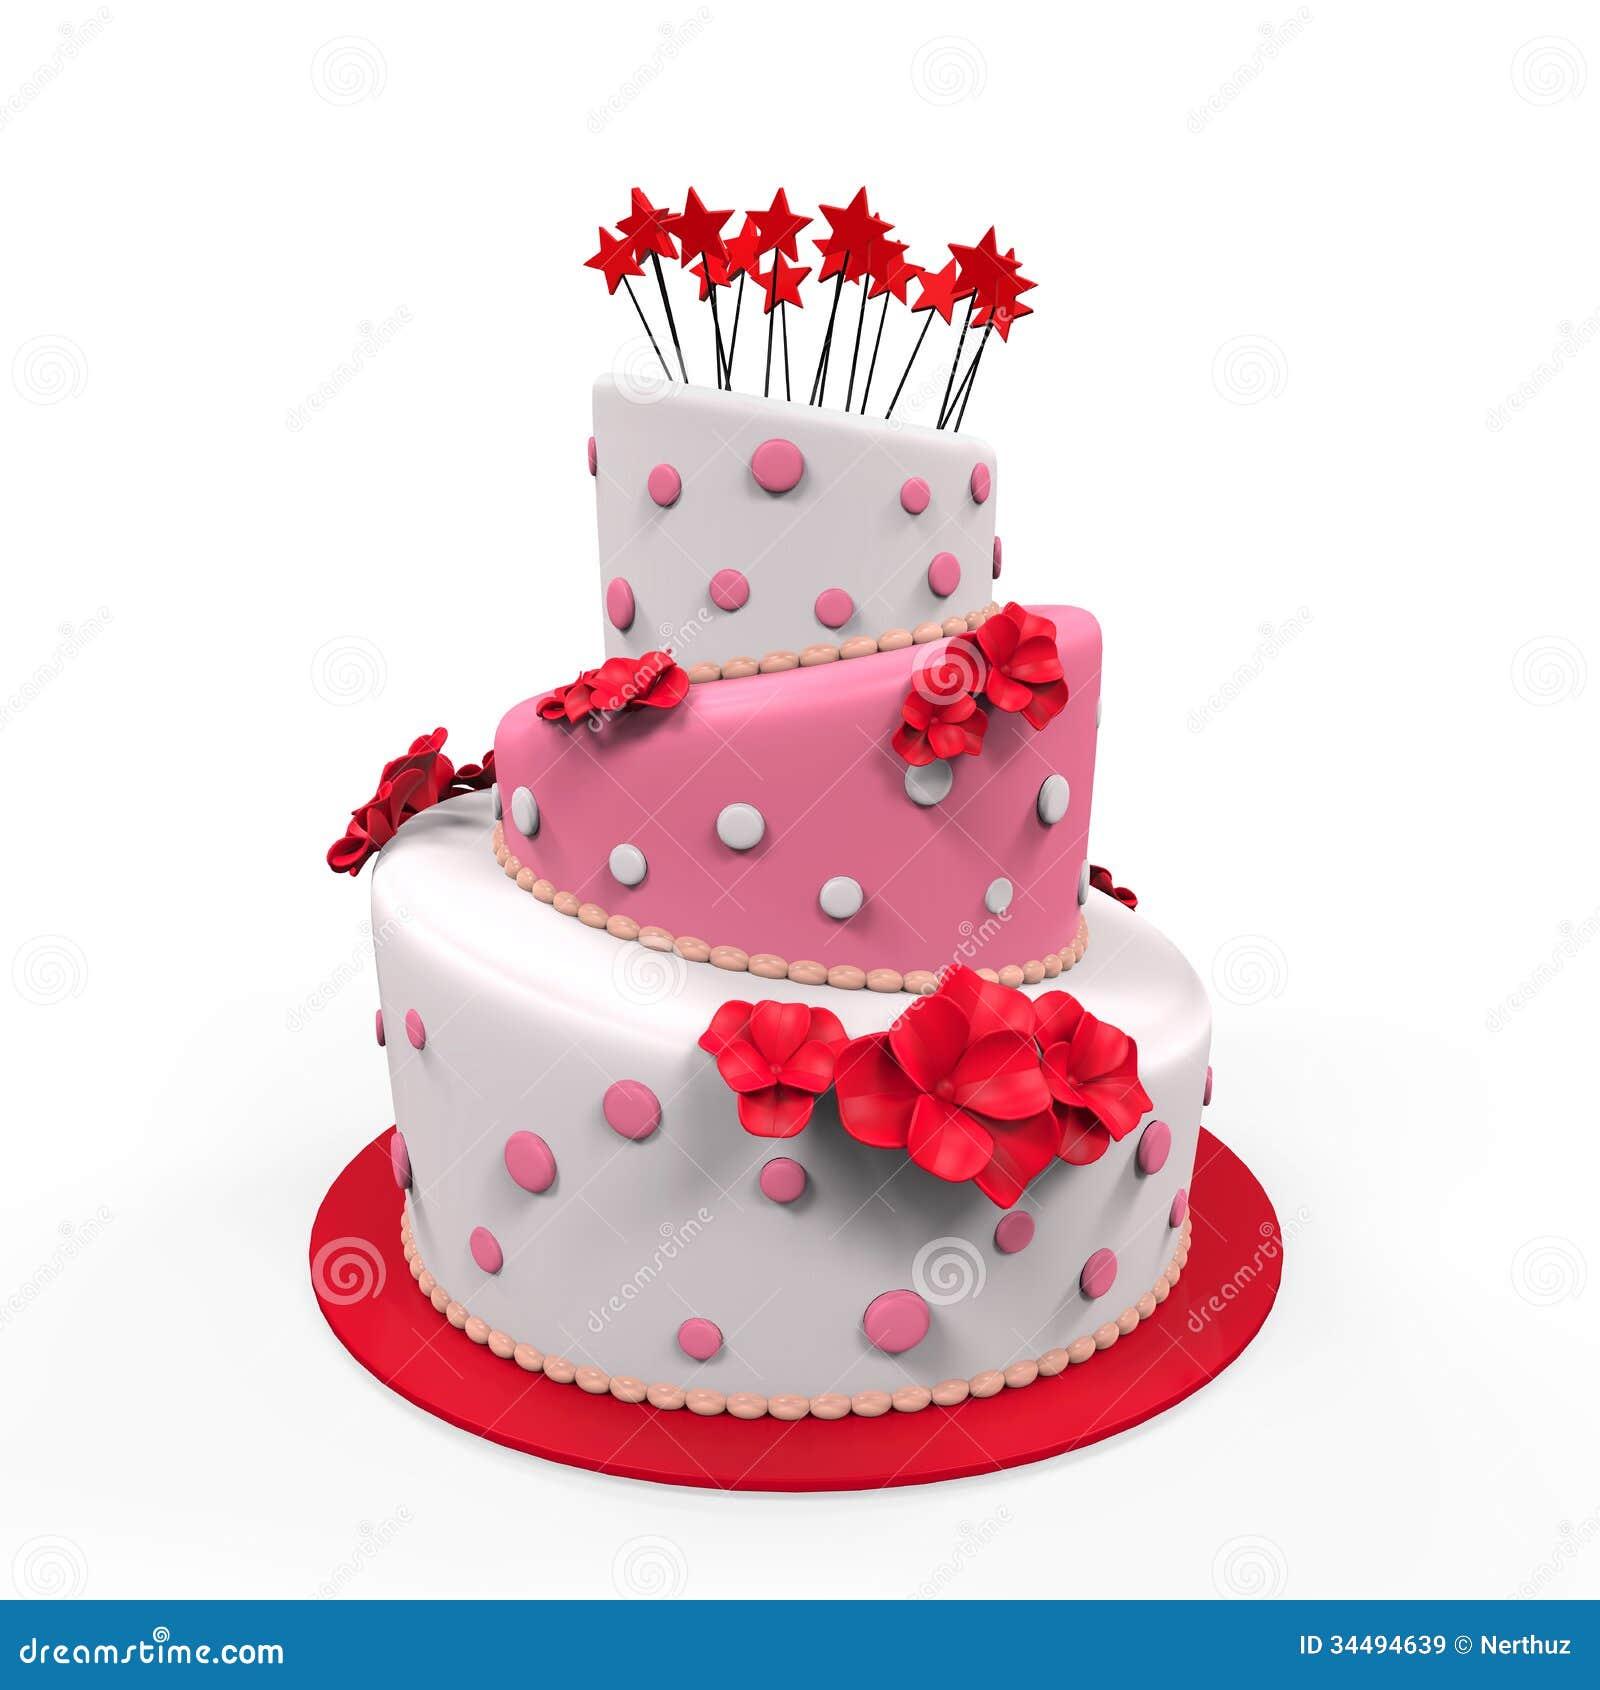 Big Cake Images Download : Big Cake Royalty Free Stock Images - Image: 34494639